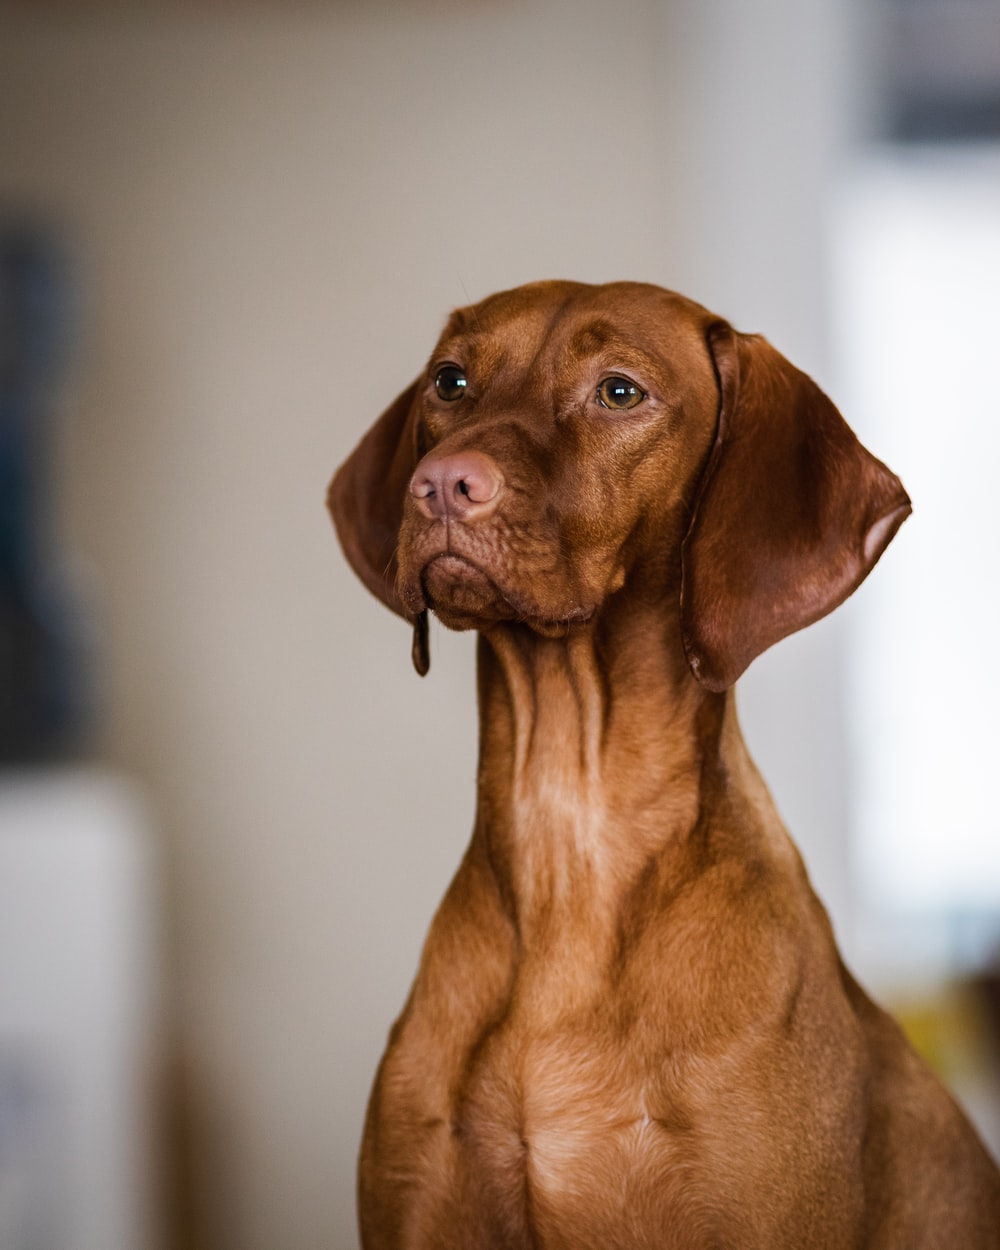 brown short coated dog looking at the camera